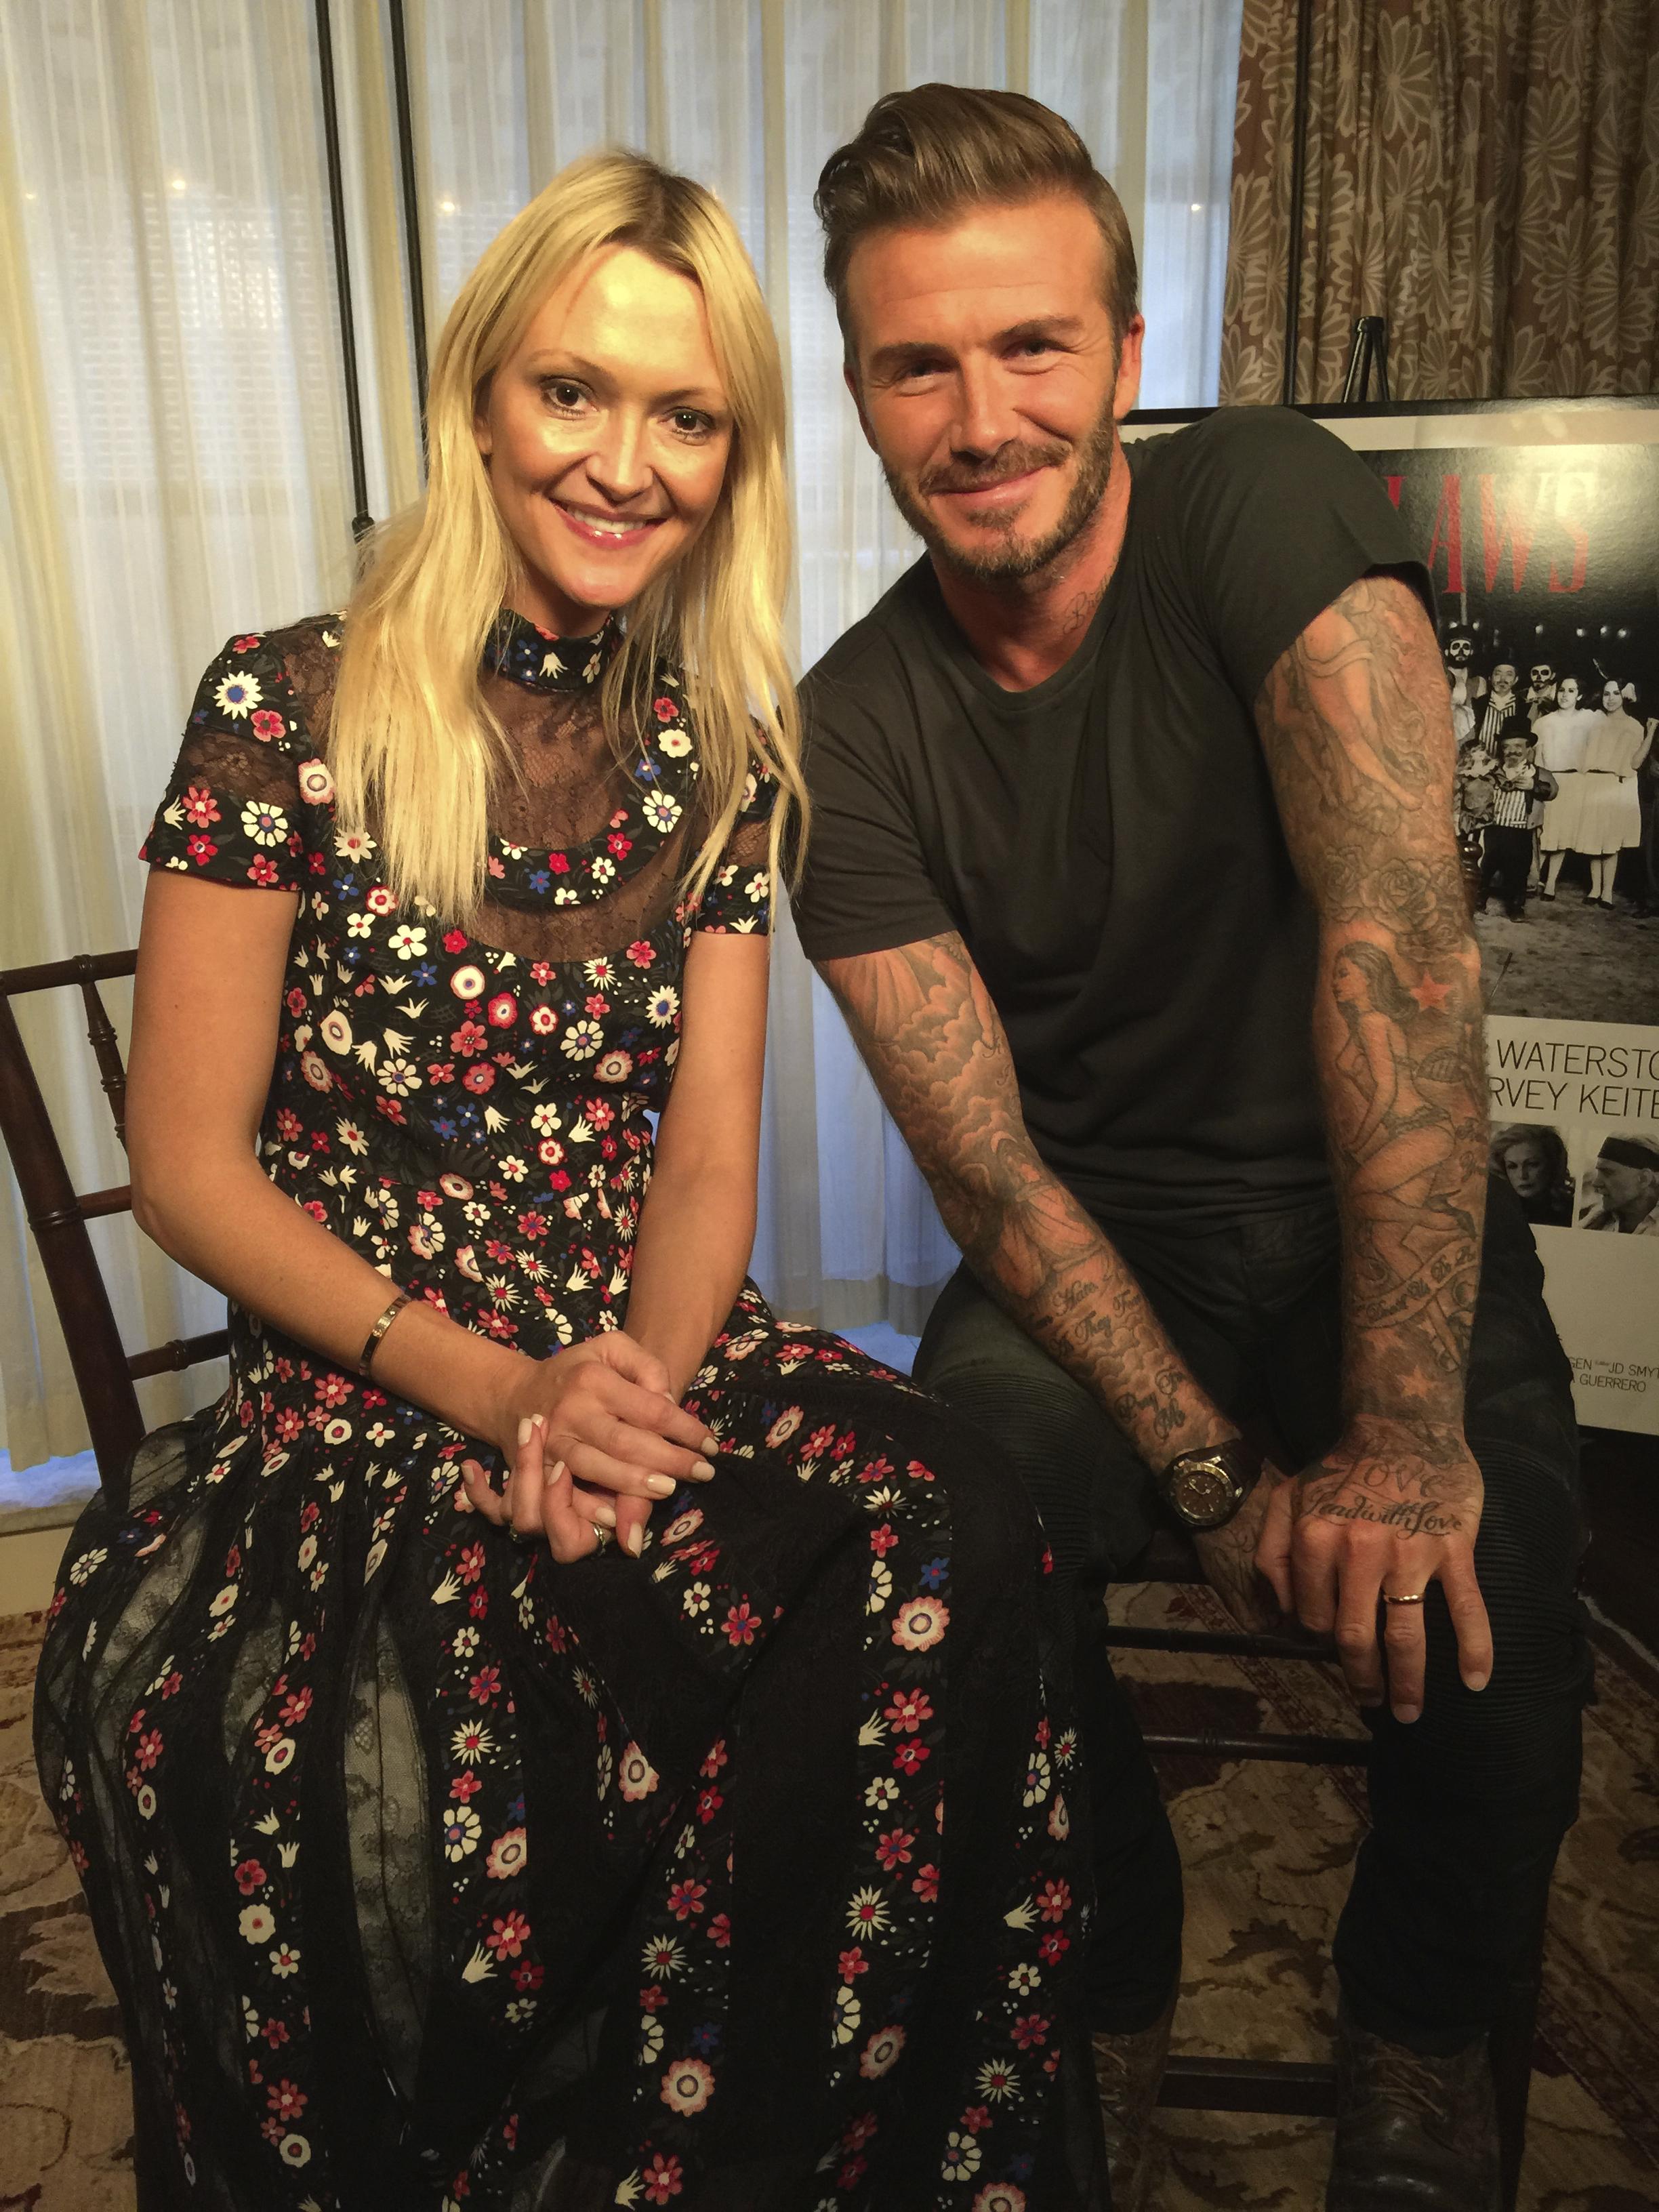 Zanna and David Beckham